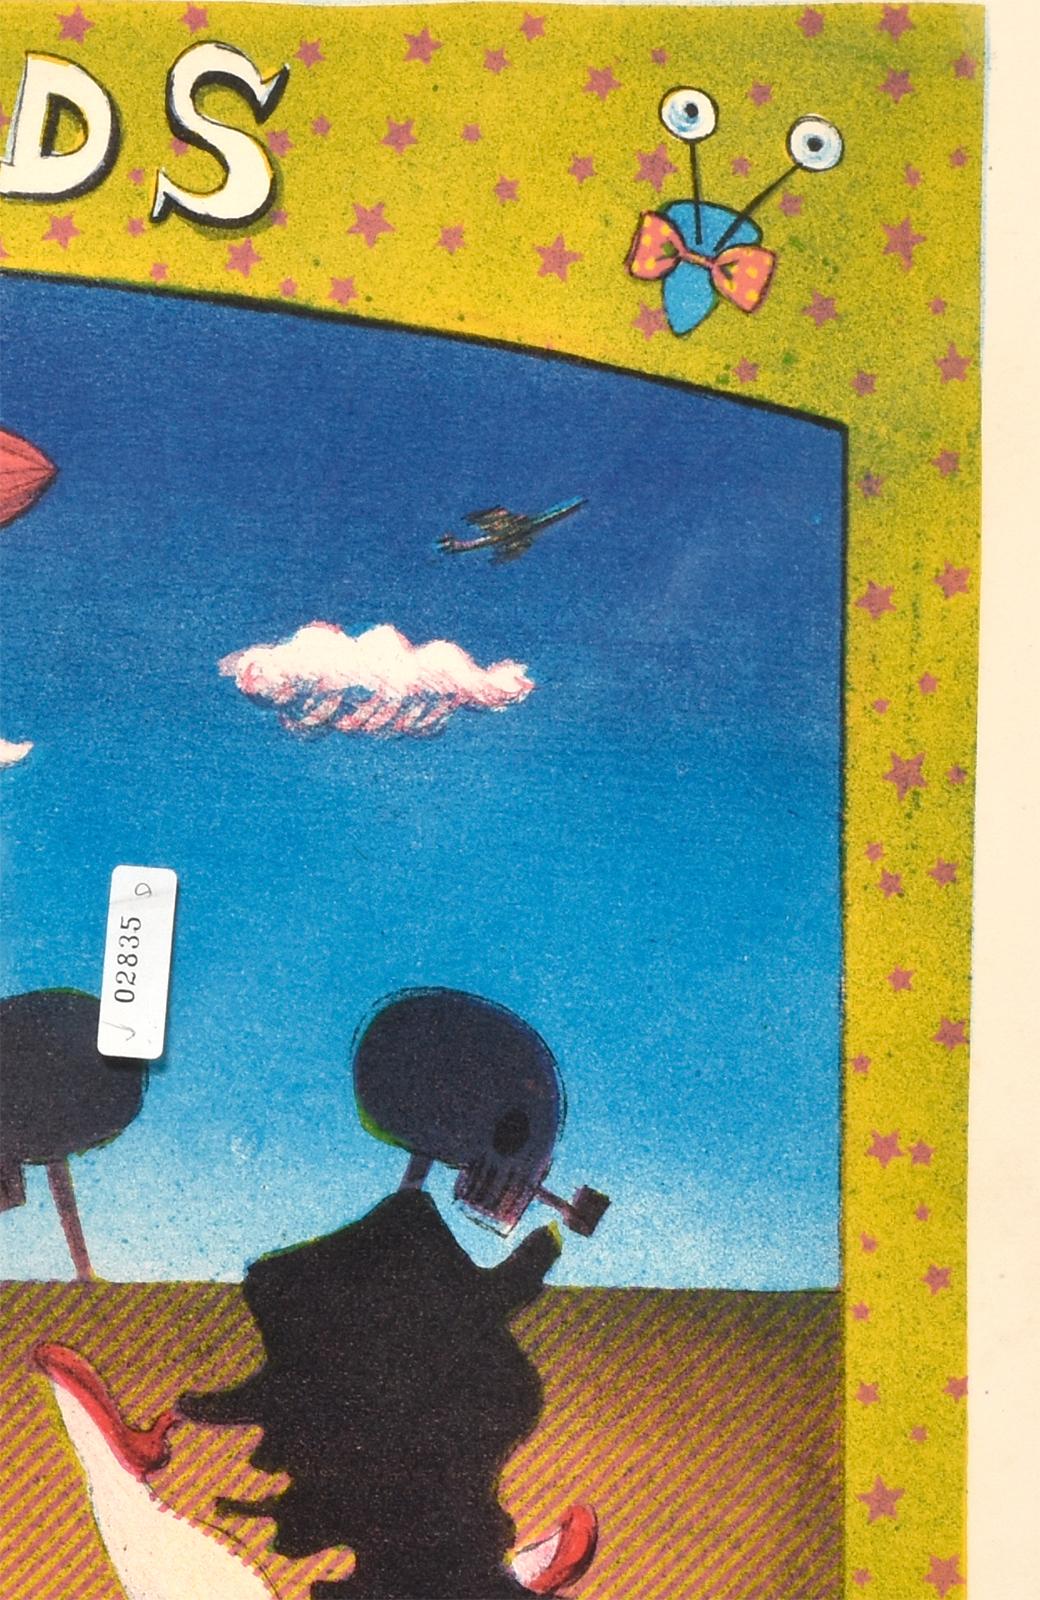 haco! 【アート】馬場檮男 「クレージーキット・3」 <その他>の商品写真4